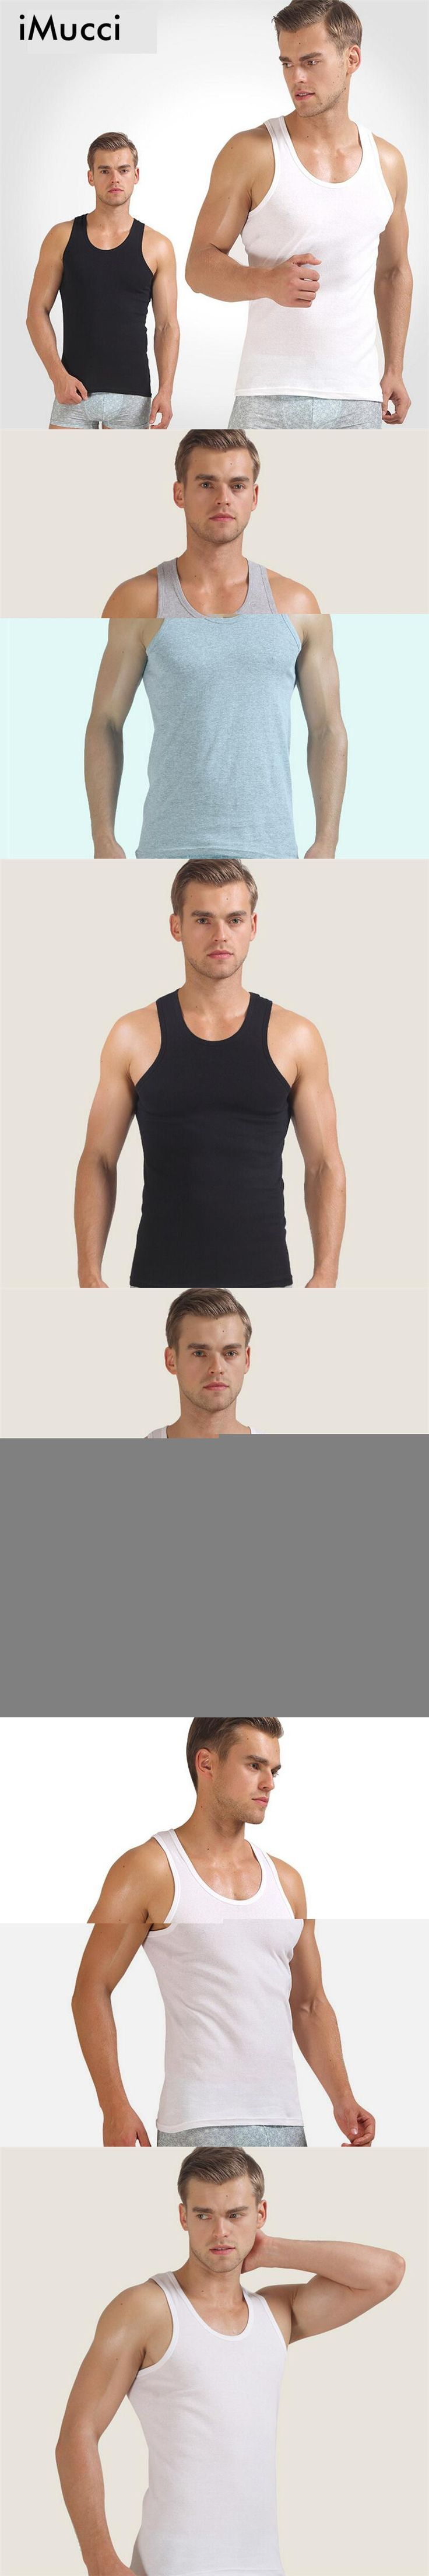 iMucci White Men Vest Men's Tank Tops Black 100% Cotton Sleeveless Undershirts Male Bodybuilding Tank Tops Summer Casual Vests